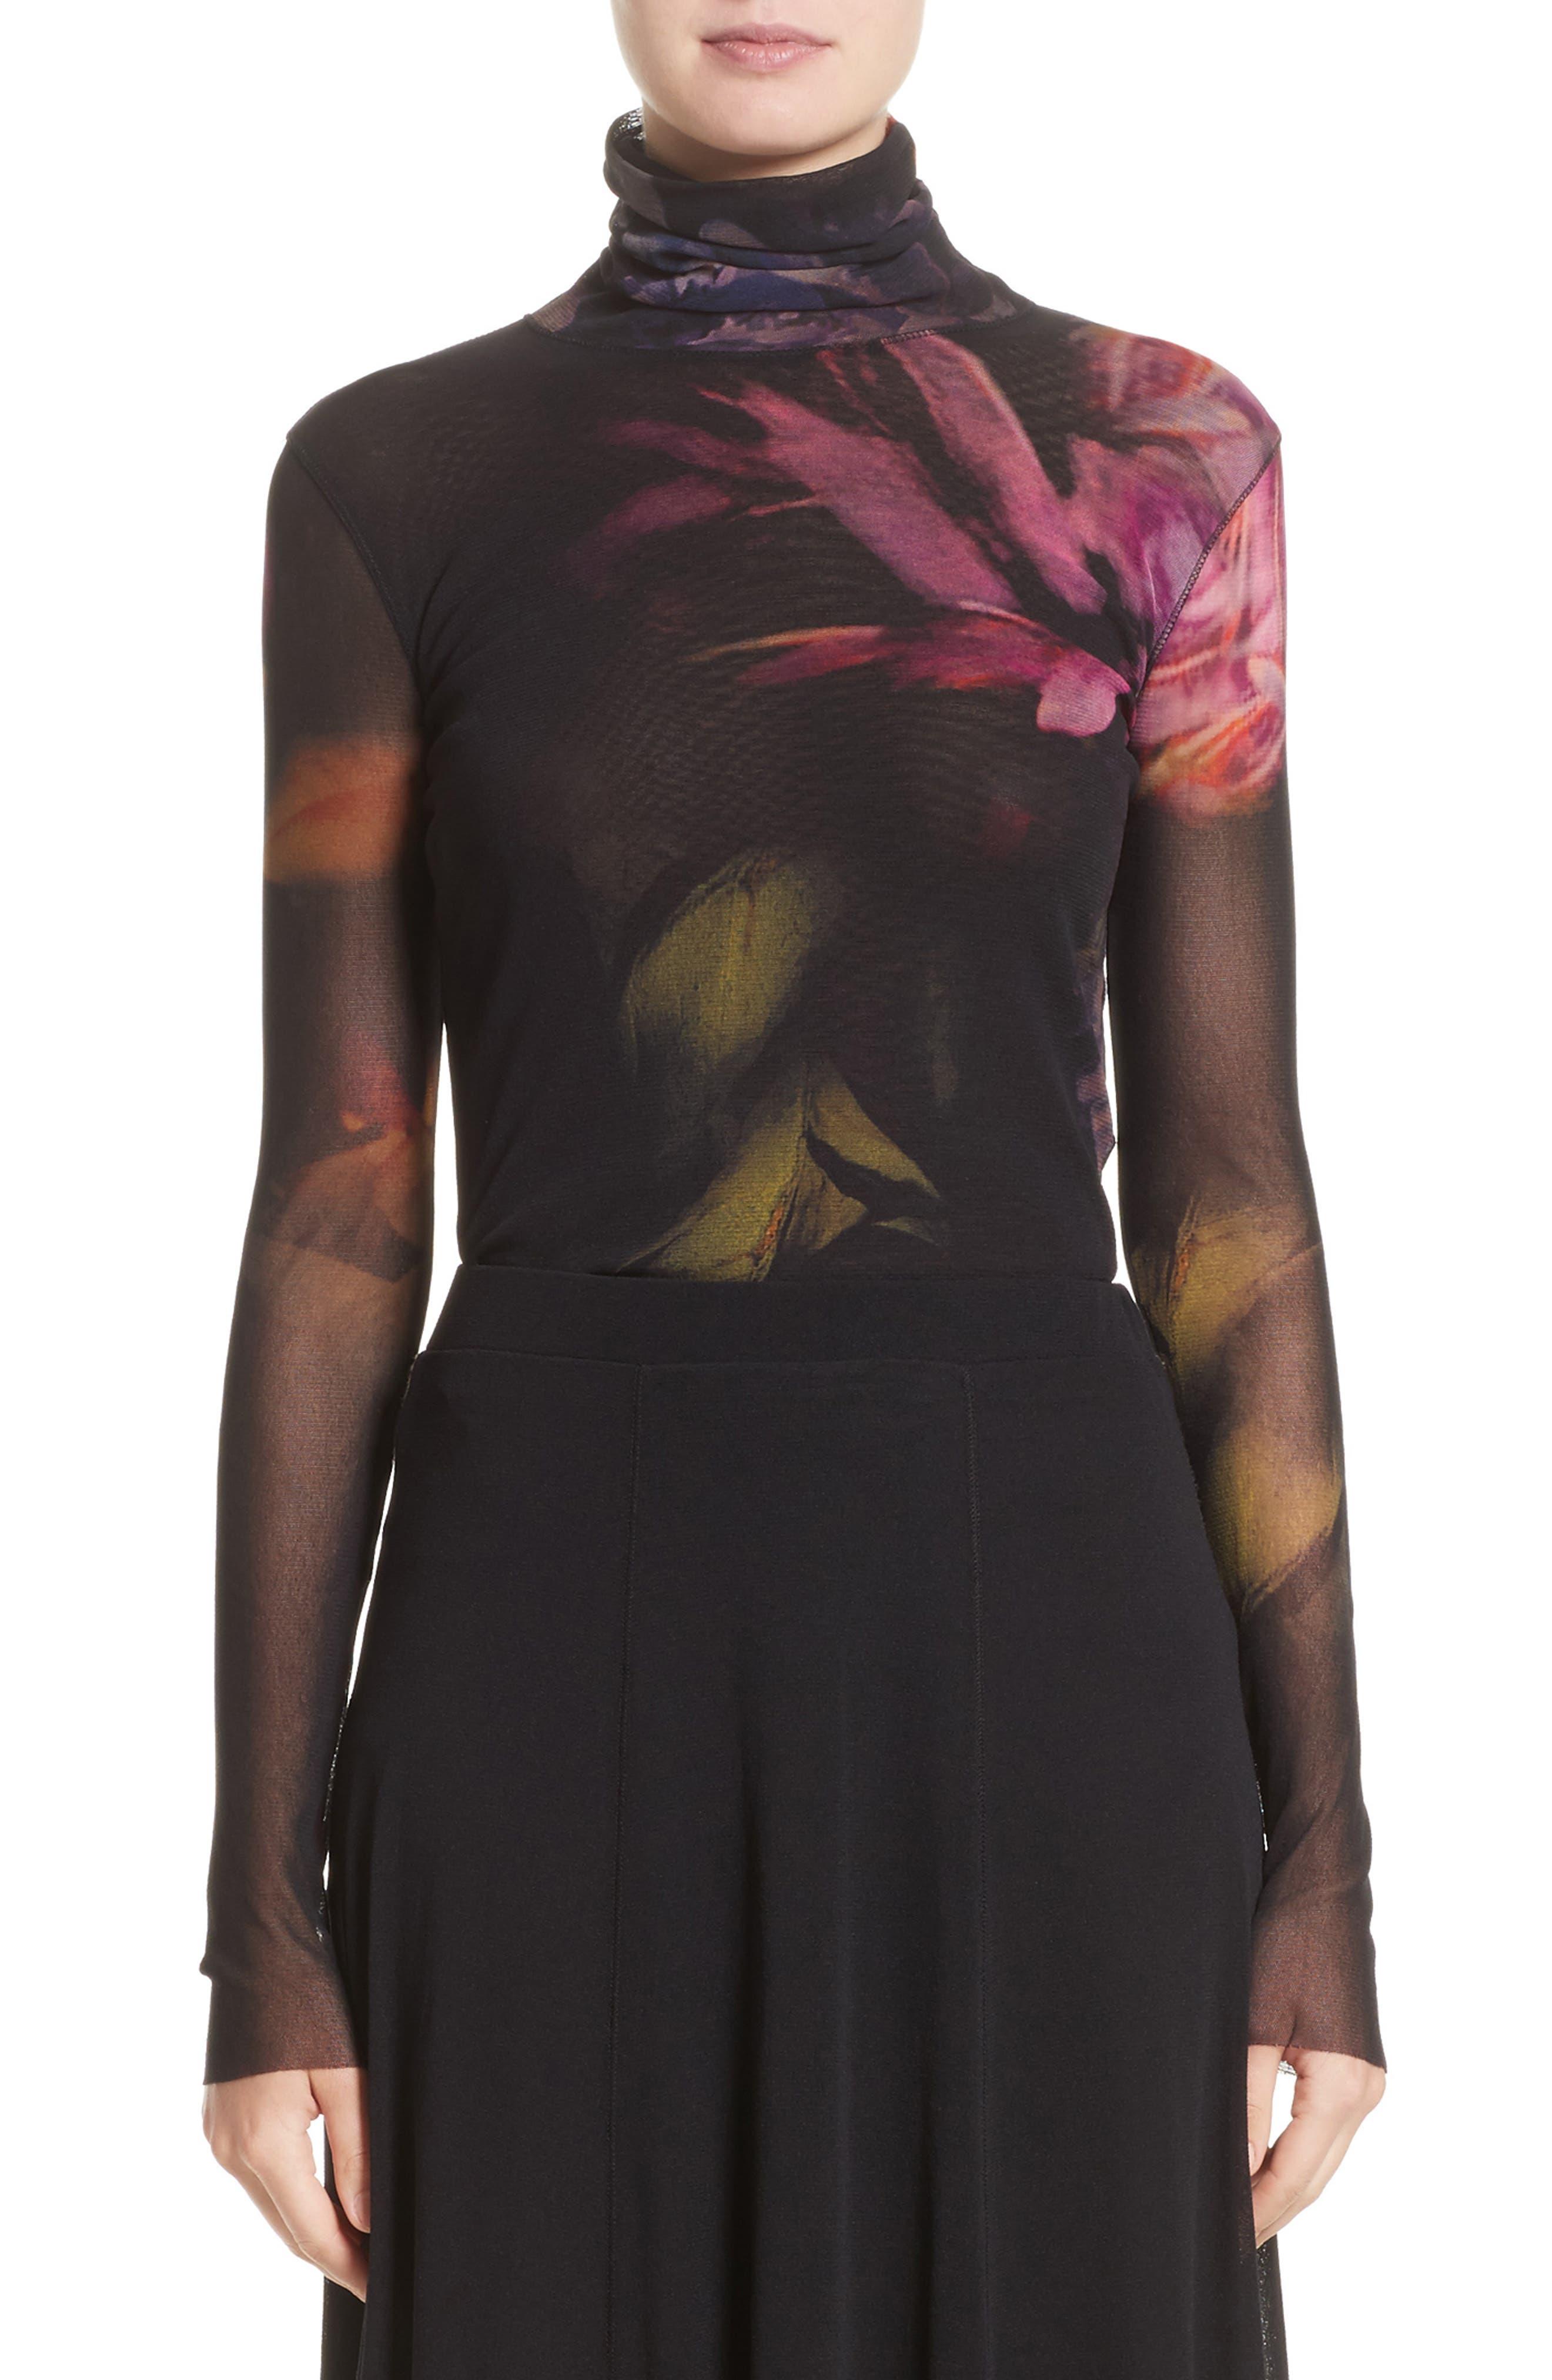 Alternate Image 1 Selected - Fuzzi Floral Print Tulle Turtleneck Top